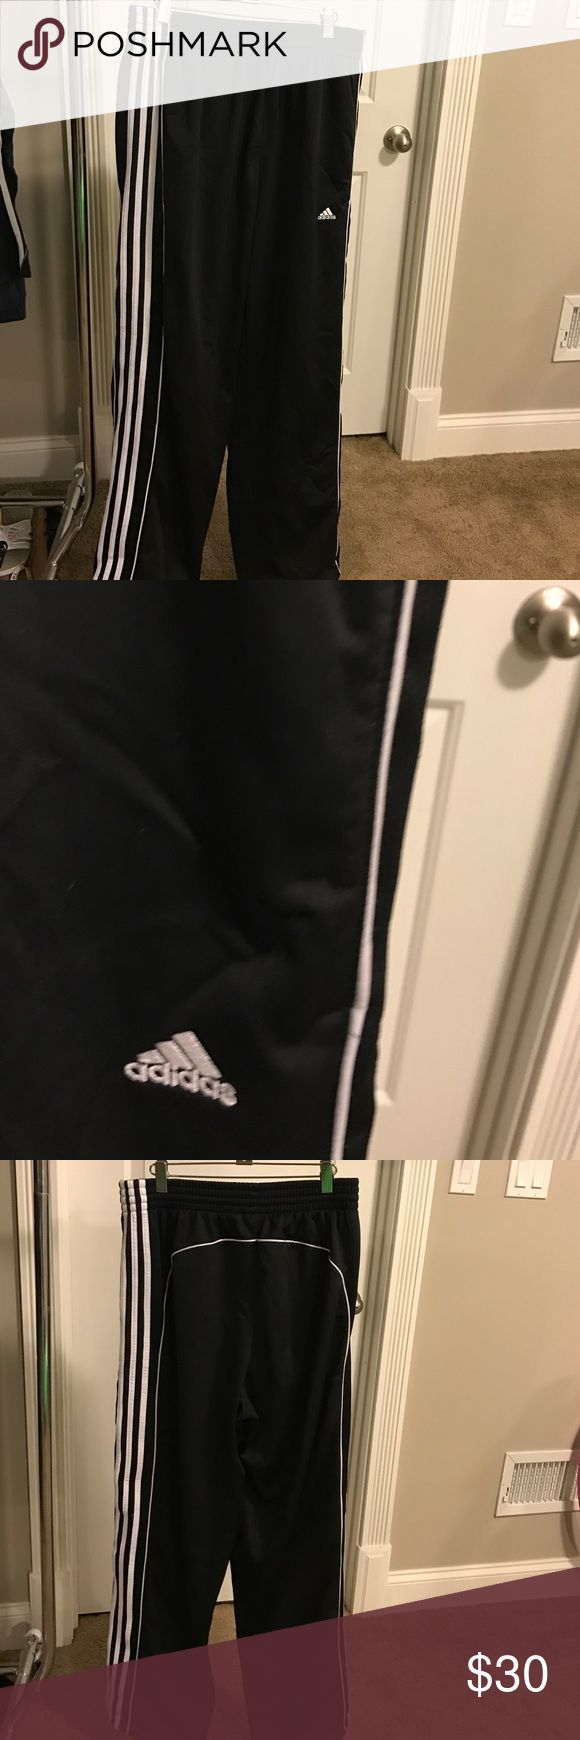 "Men's Adidas sweatpants!! Men's Adidas classic adidas sweatpants!! Like New!!! Inseam is 32"". Thicker material Adidas Pants Sweatpants & Joggers"